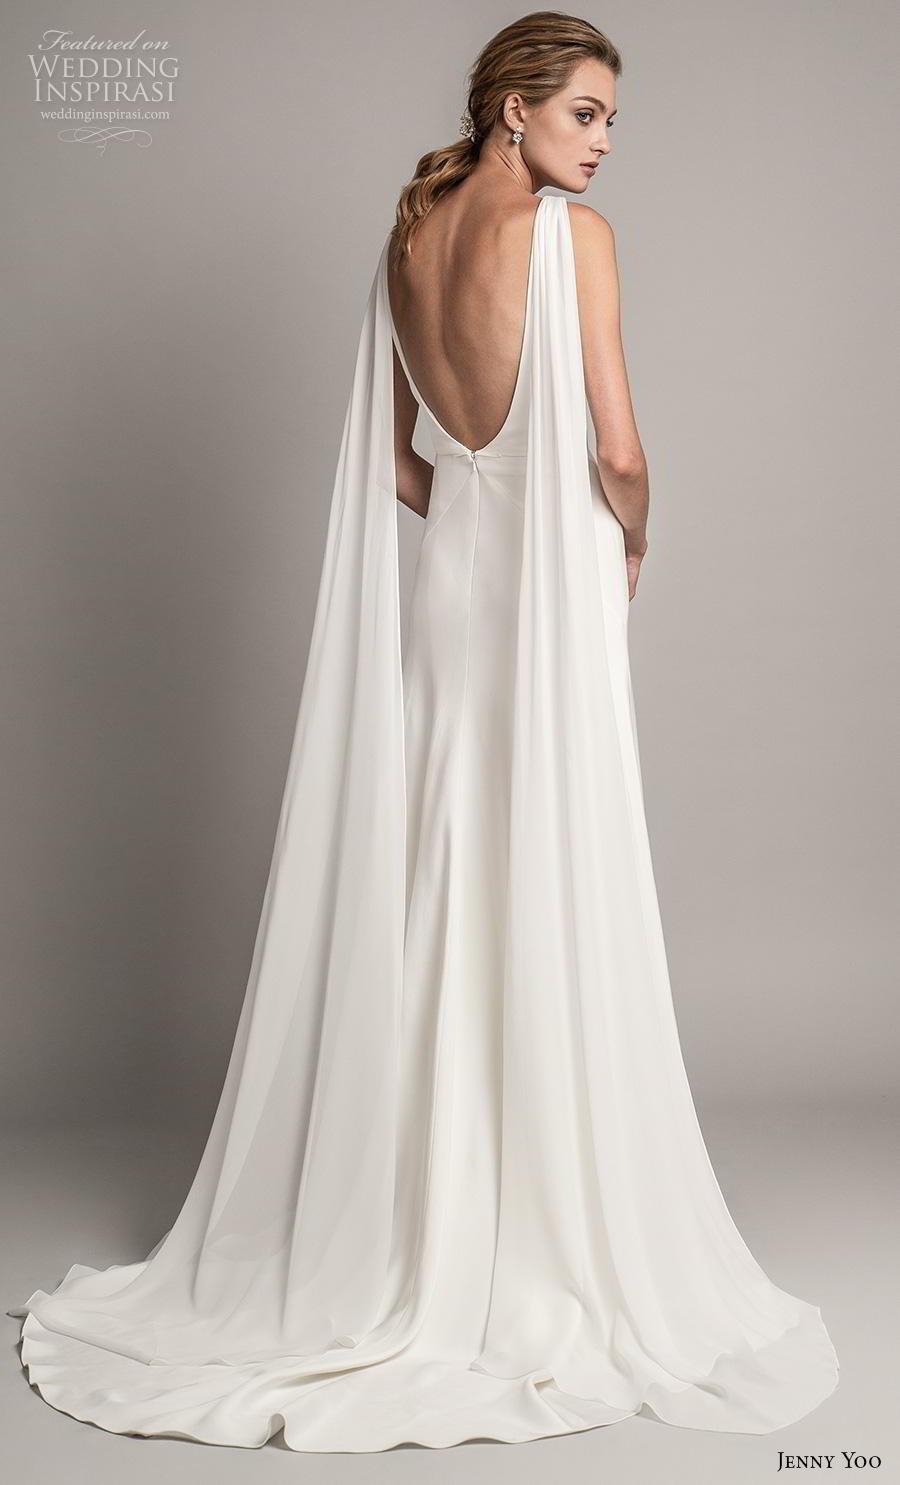 jenny yoo spring 2019 bridal long hanging sleeves deep v neck simple minimalist elegant clean look modified a  line wedding dress backless scoop back short train (1) bv